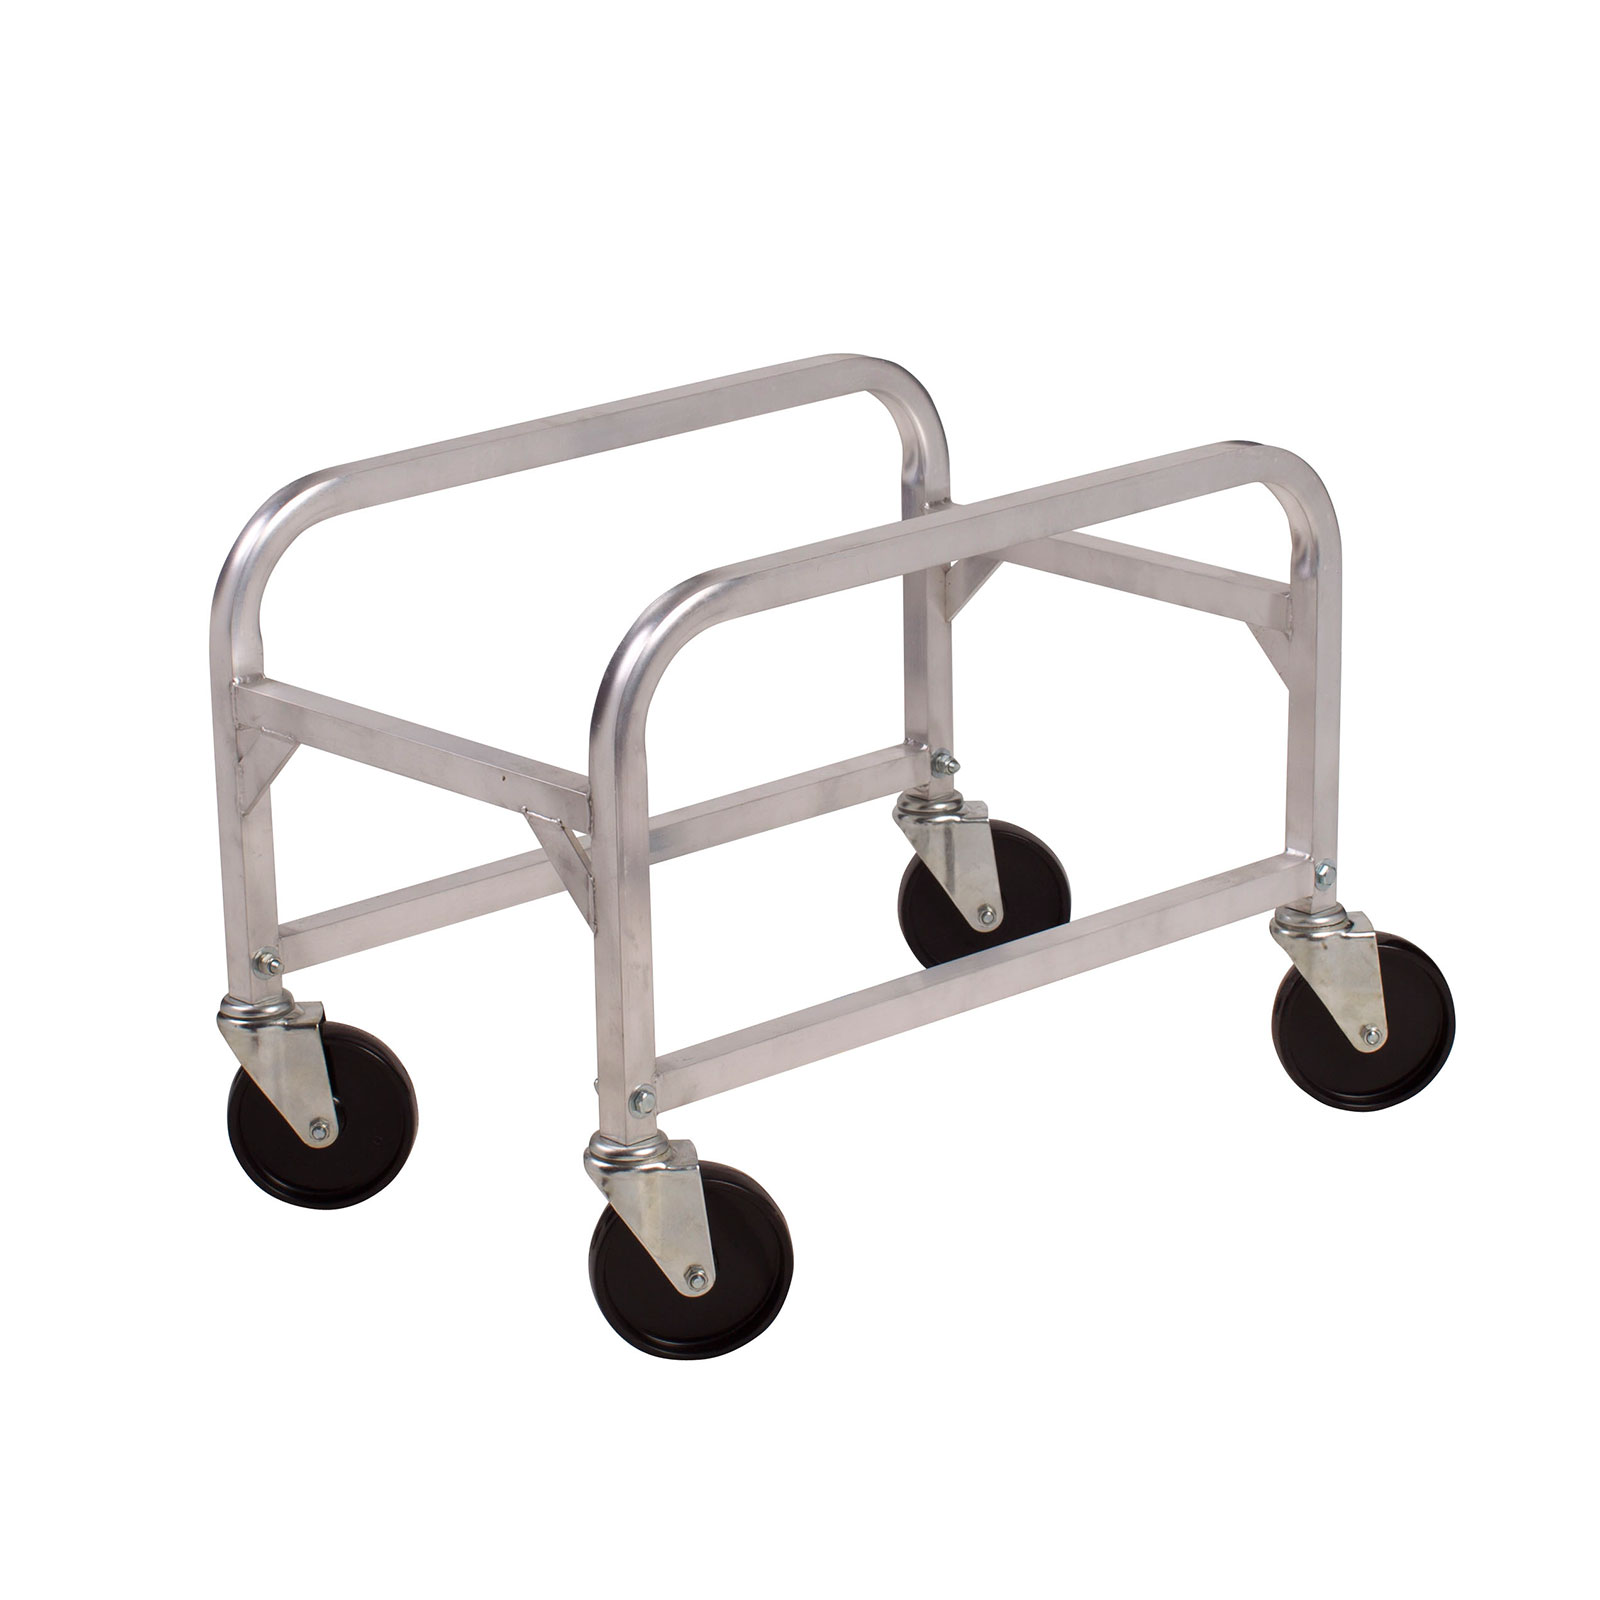 Winco ALBC-1 lug rack